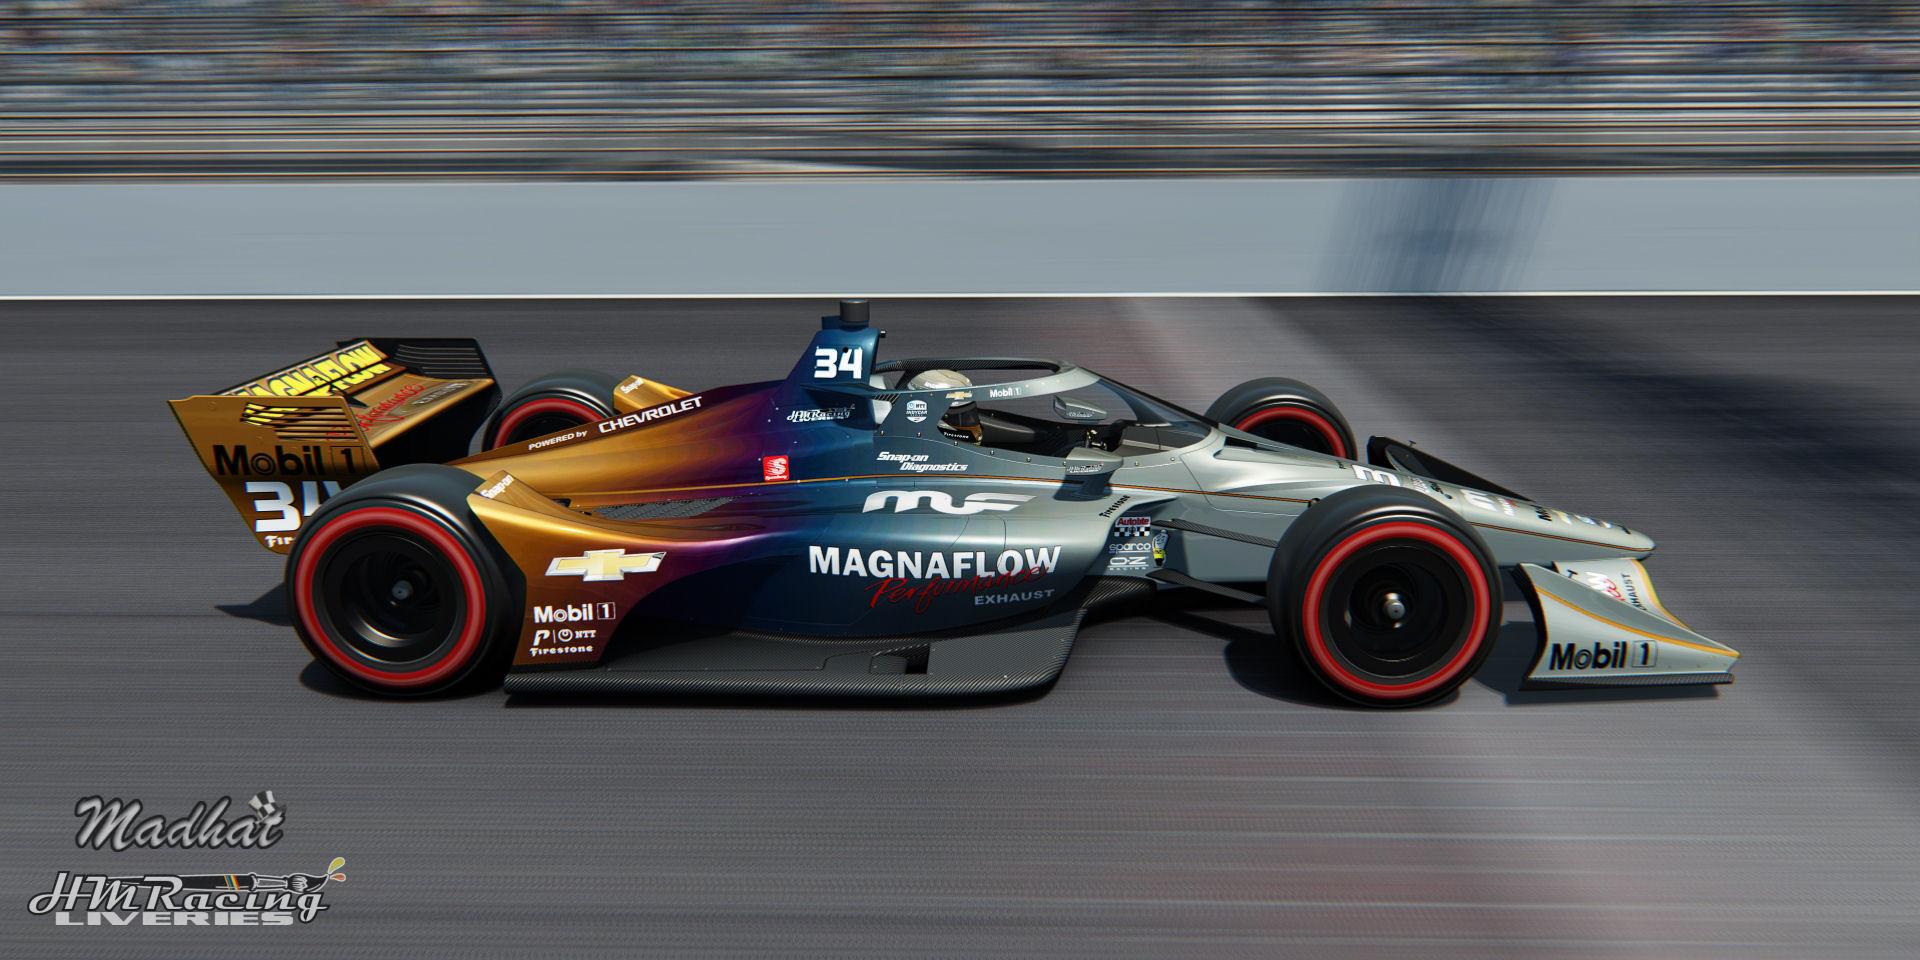 MAGNAFLOW 34 IndyCar Madhat HMRacing Liveries 10.jpg